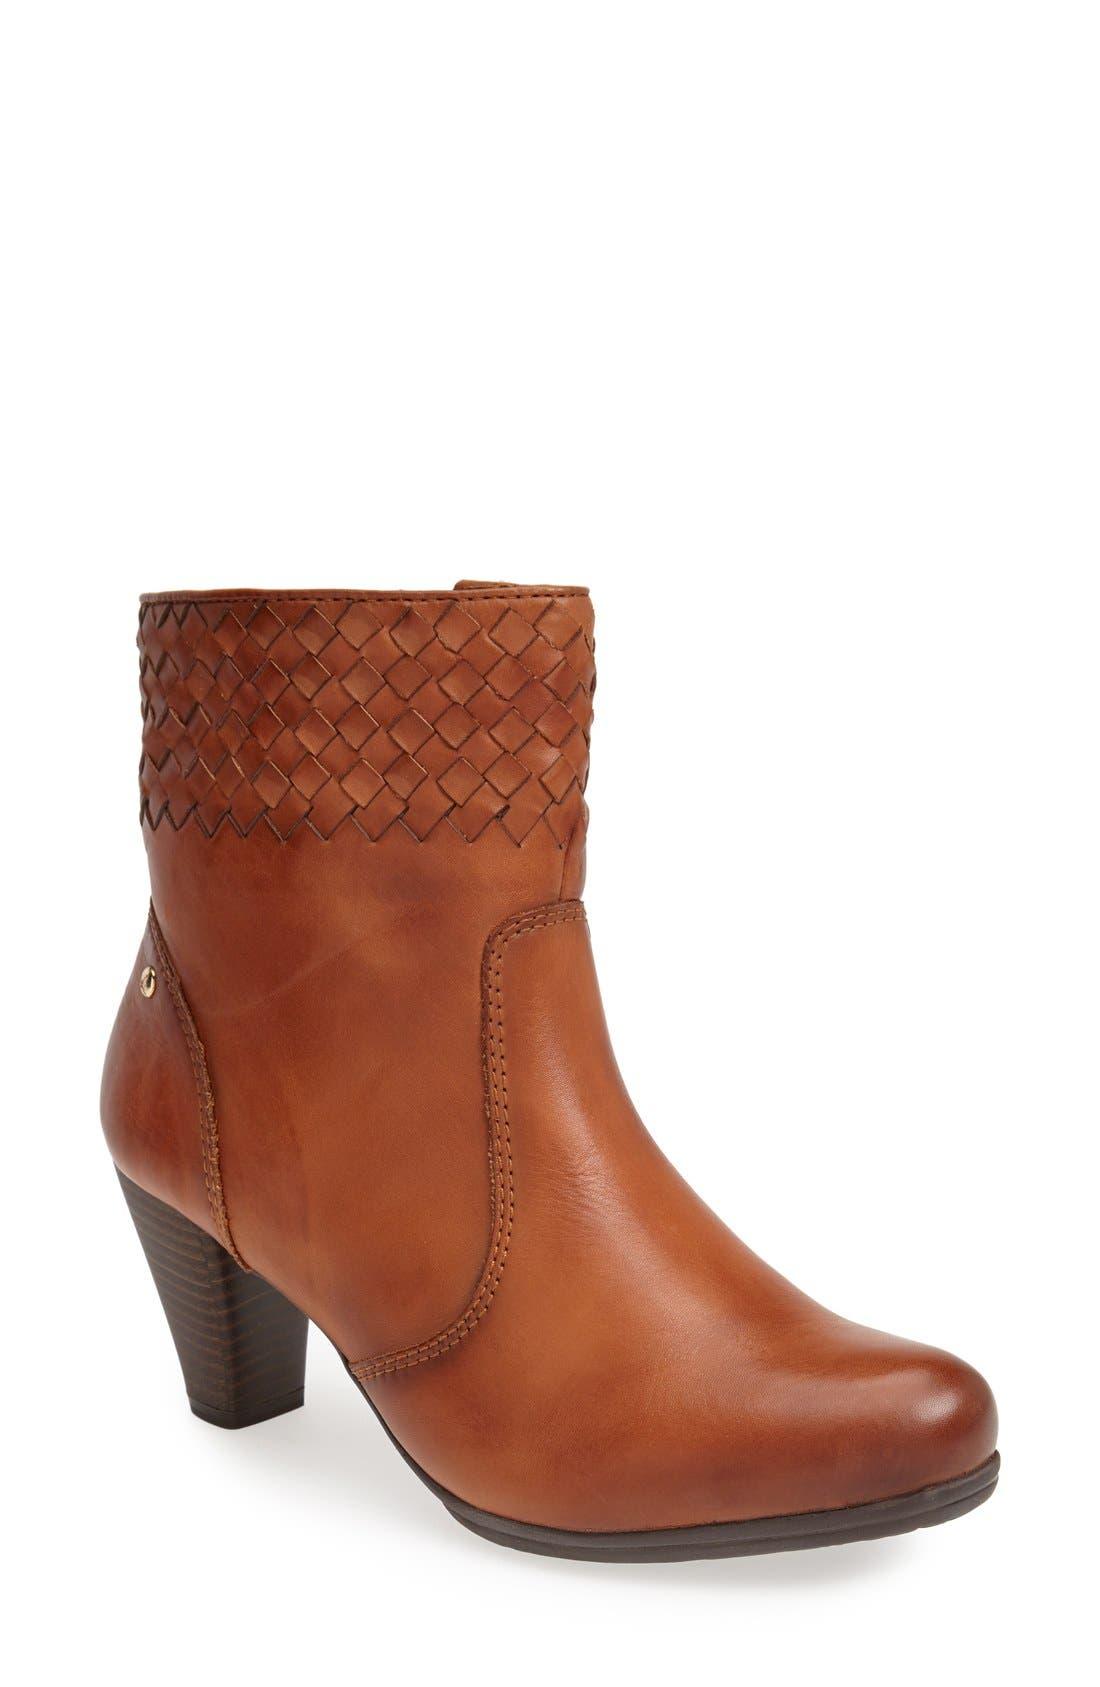 Alternate Image 1 Selected - PIKOLINOS 'Verona' Short Boot (Women)